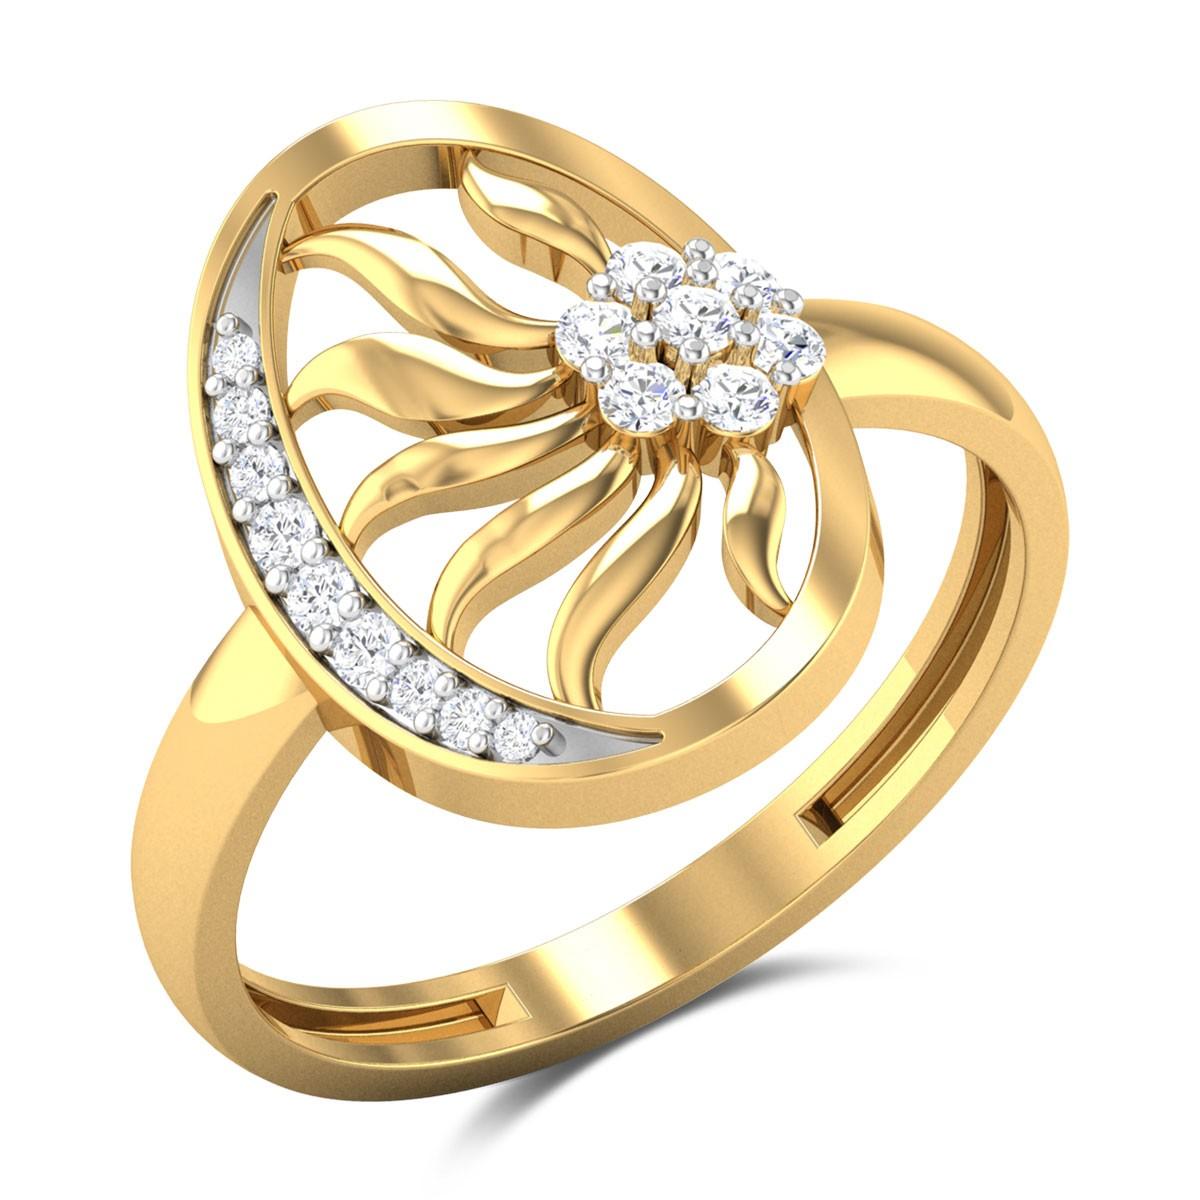 Barrett Oval Floral Diamond Ring